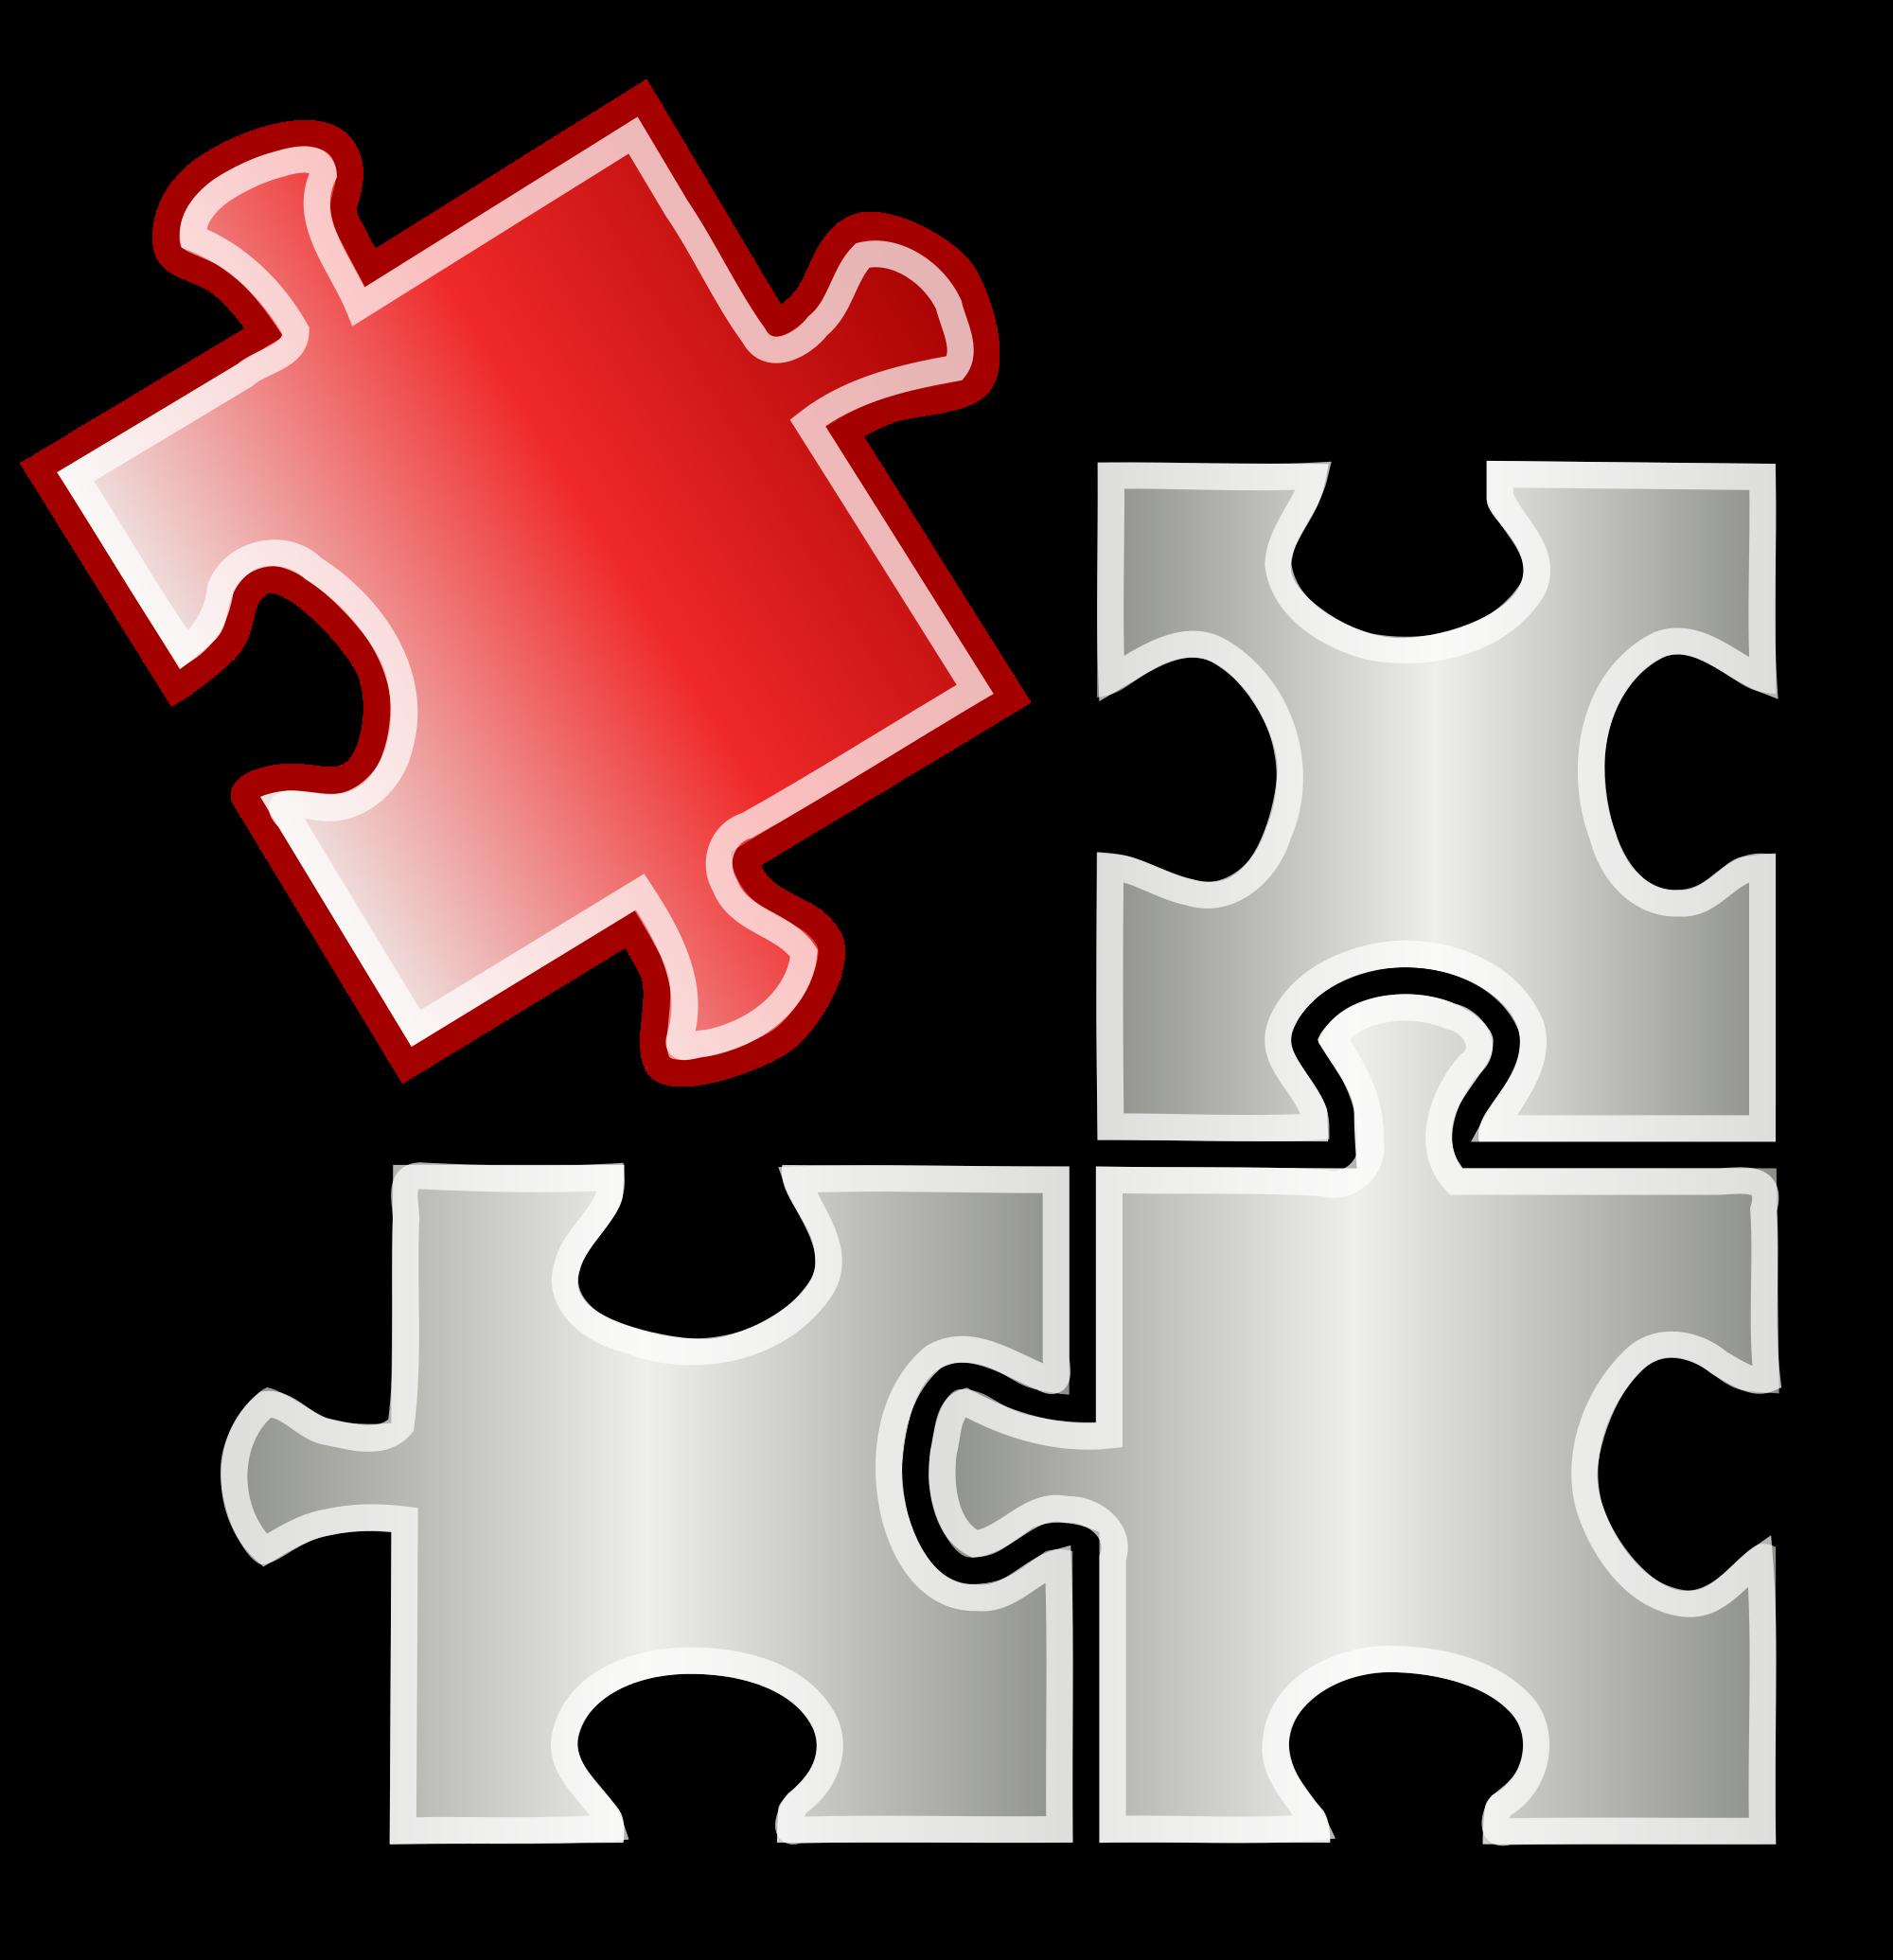 File unit svg wikimedia. Organization clipart organizational structure